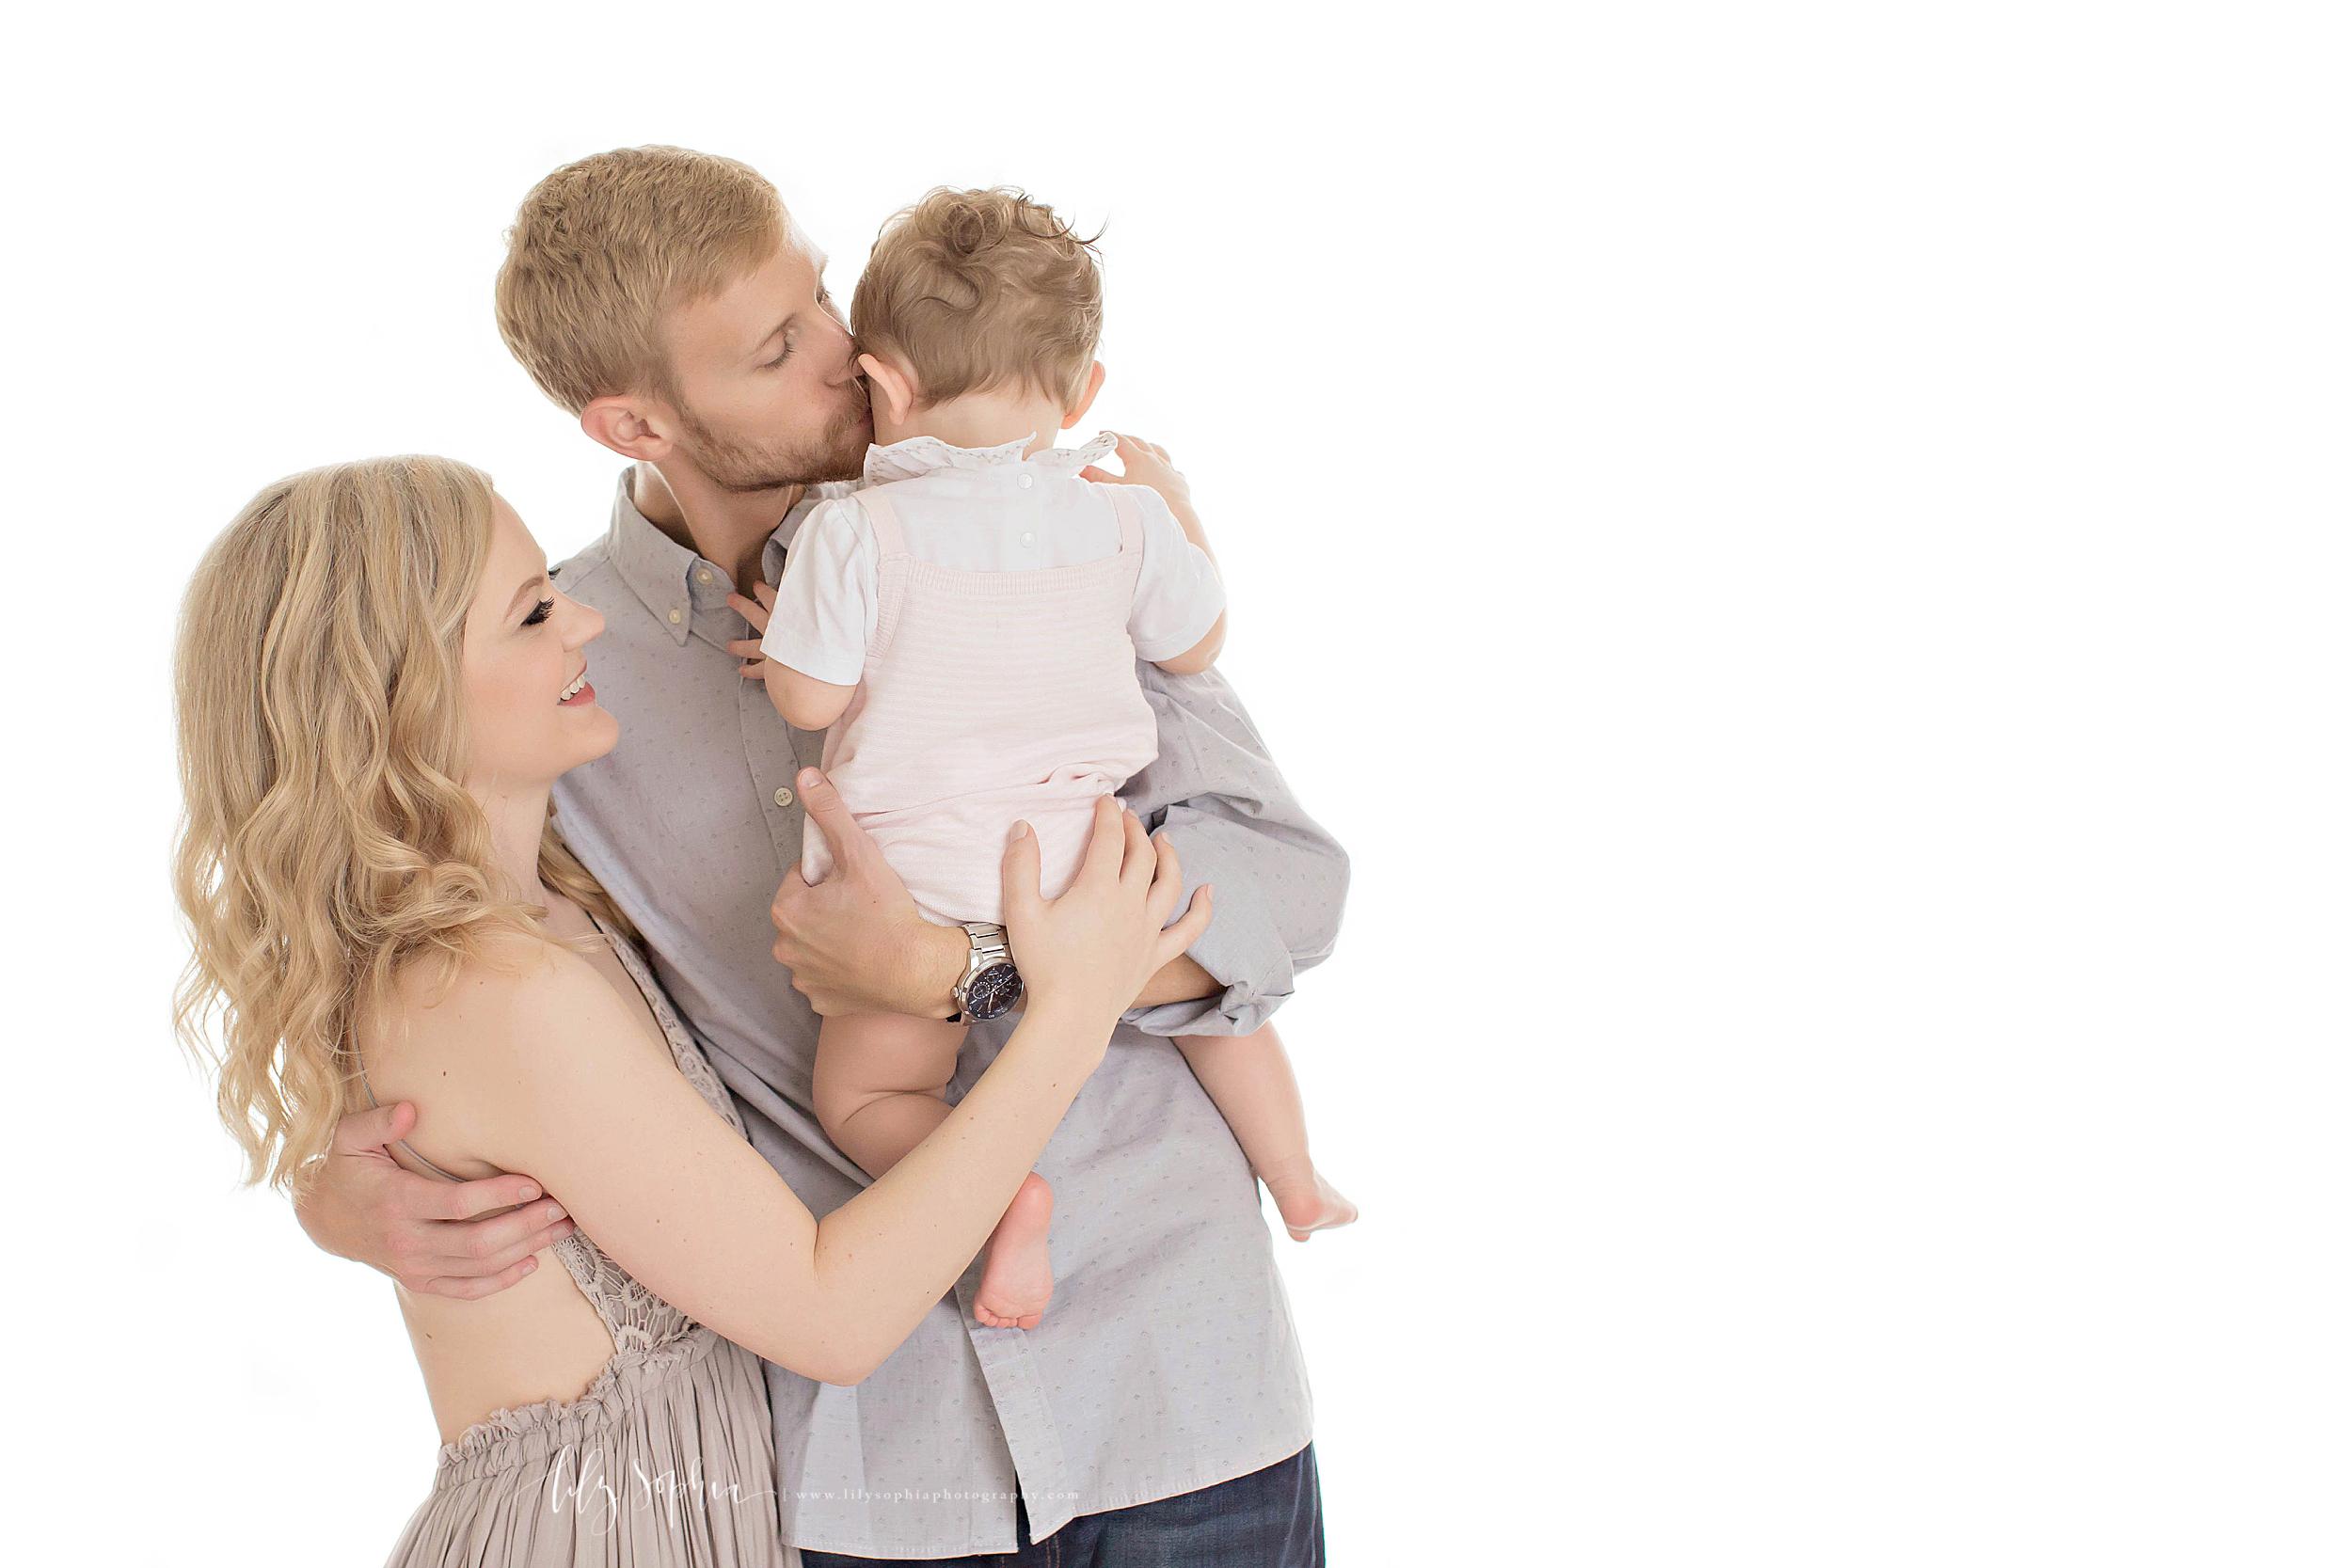 atlanta-midtown-brookhaven-decatur-lily-sophia-photography-photographer-portraits-buford-savannah-baby-girl-nine-months-family-milestone-photos_0183.jpg